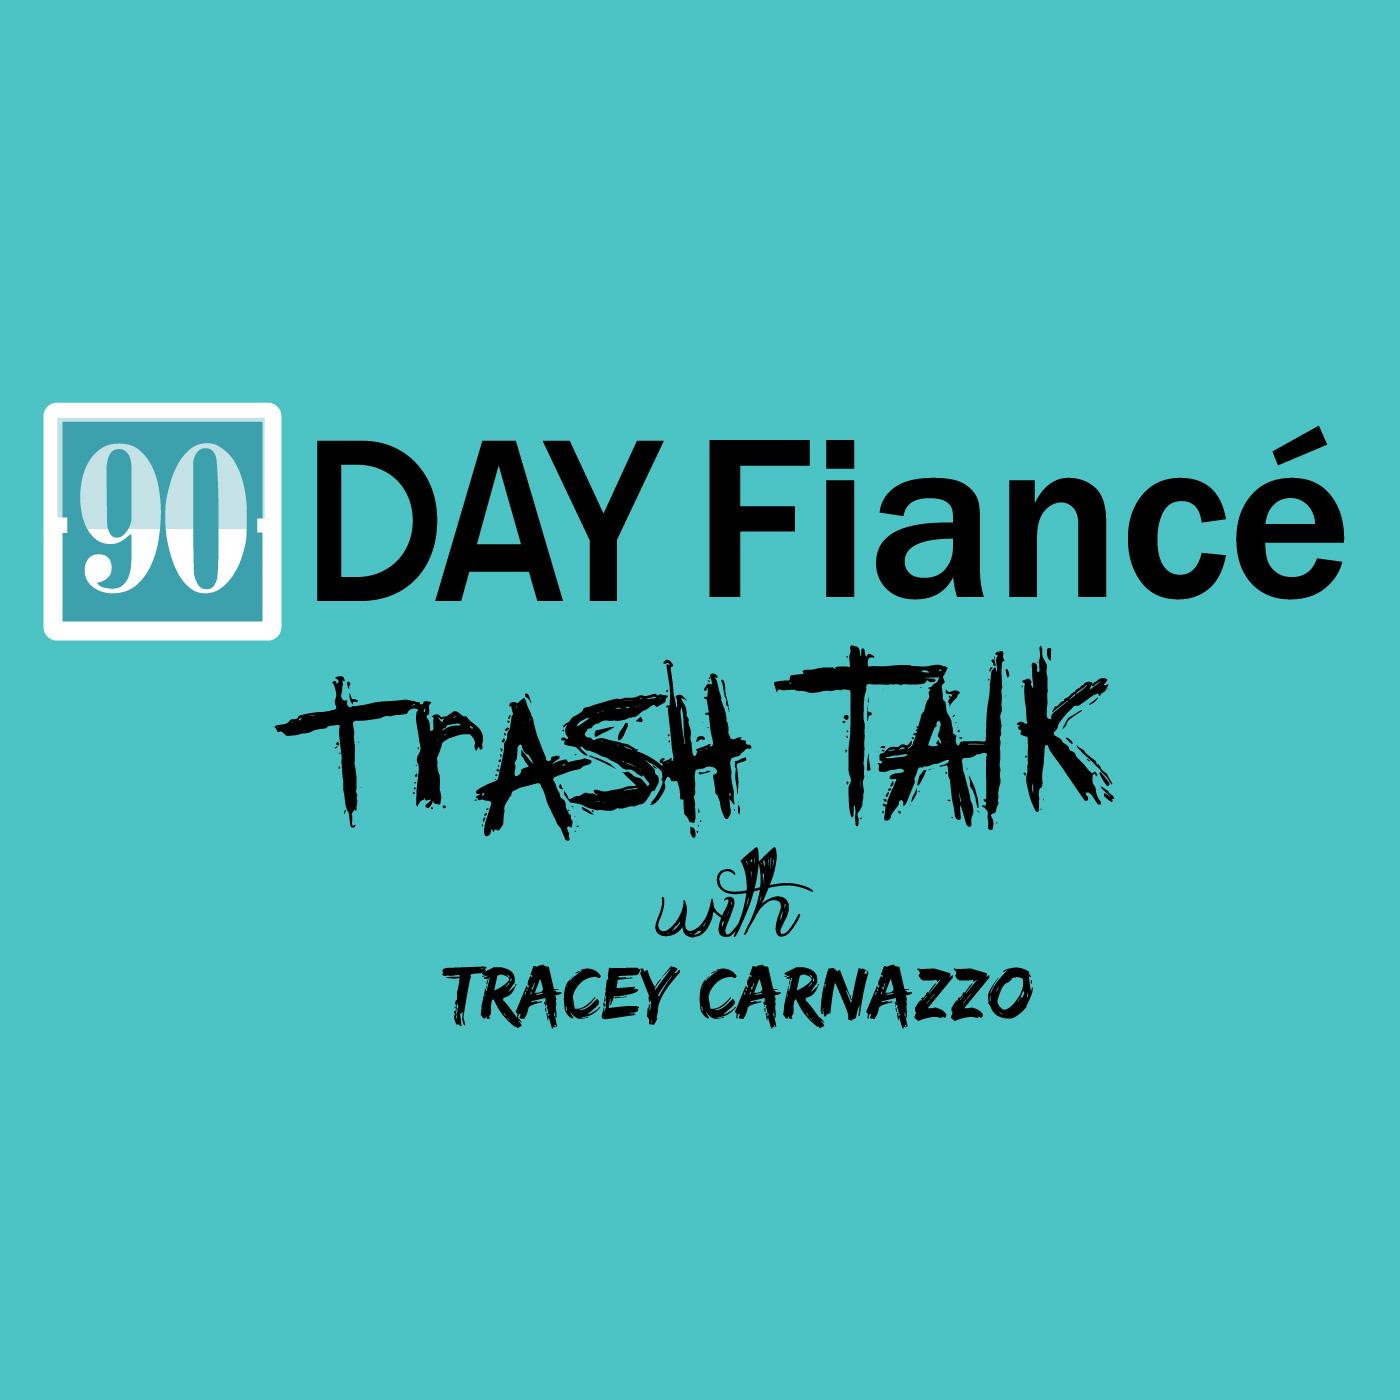 90 Day Fiance Trash Talk   Podbay